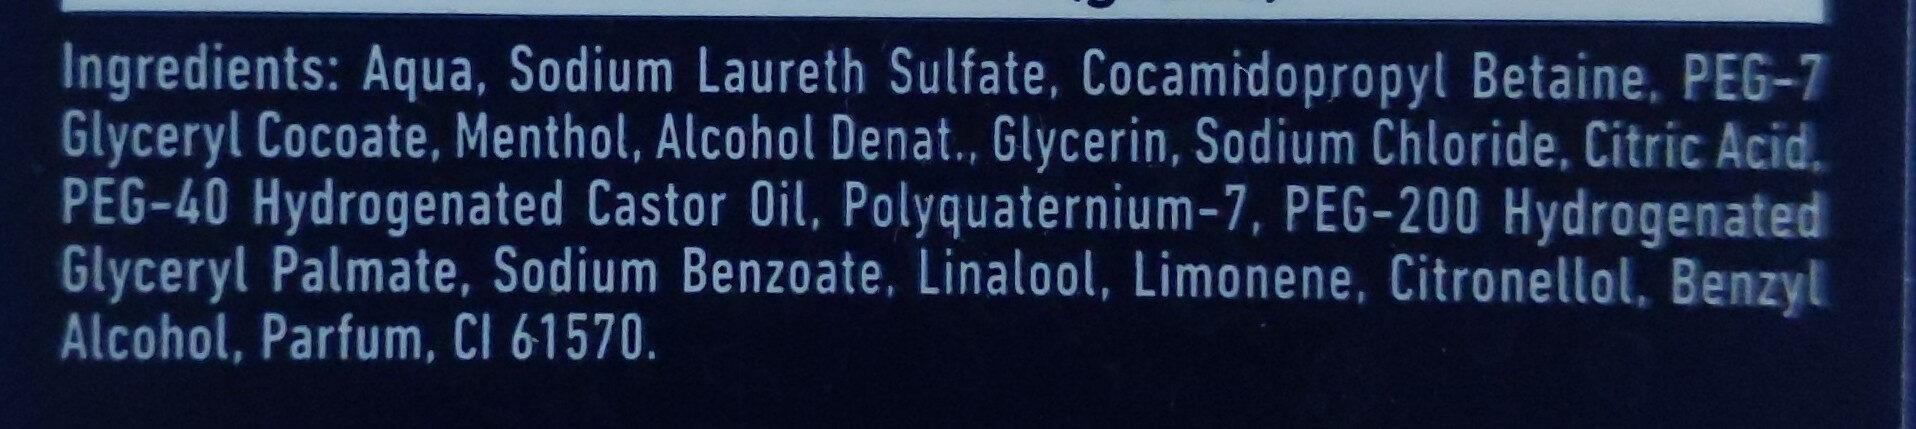 Nivea for men doccia gel energy - Ingredients - it